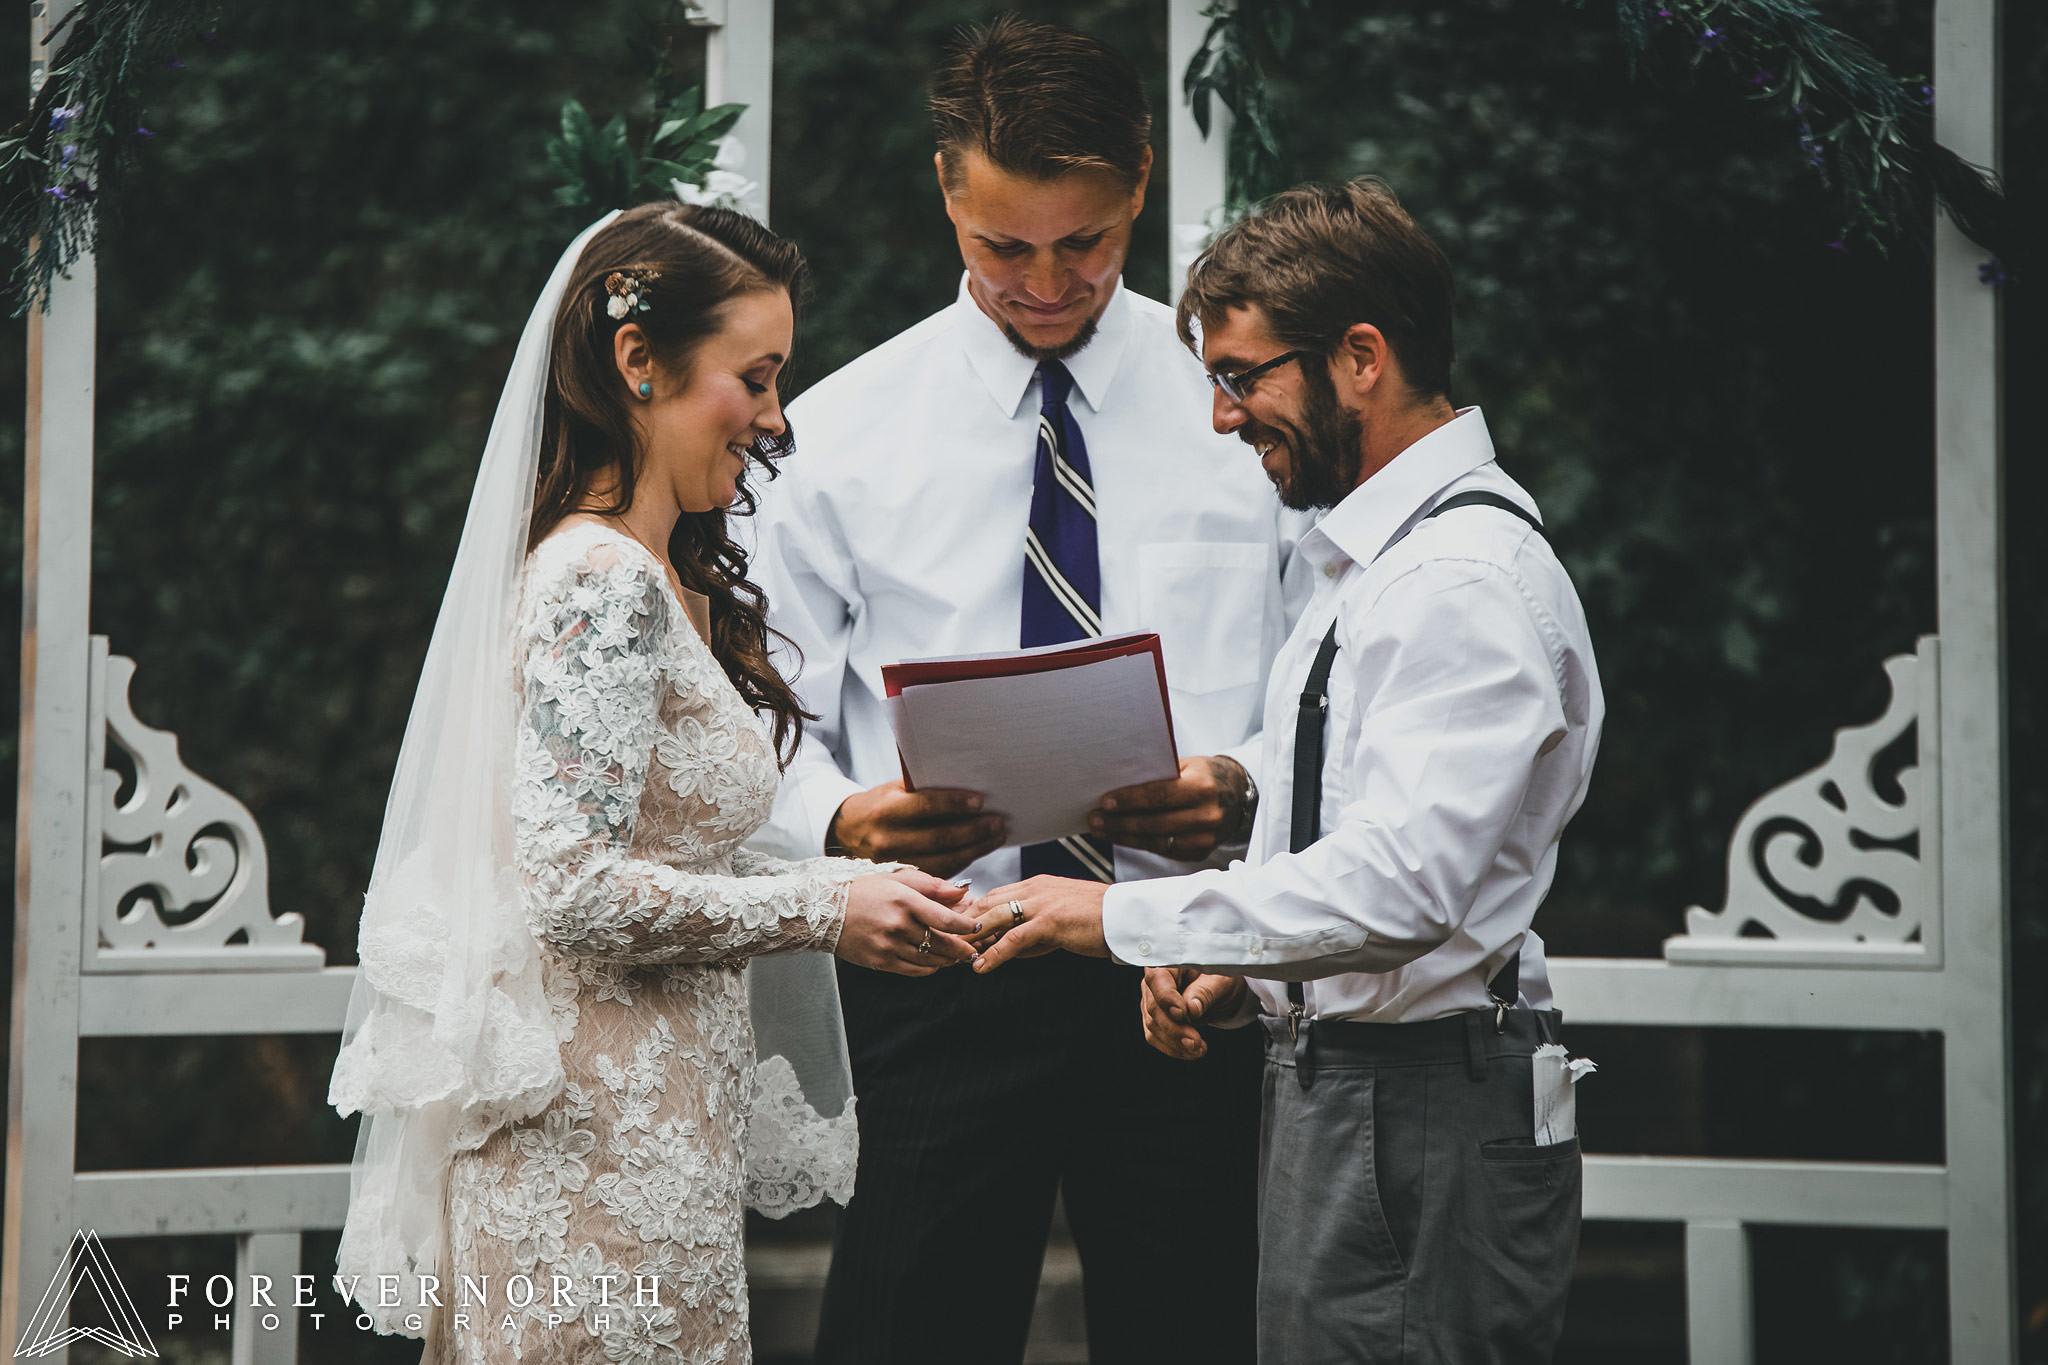 Perkins-Whitesbog-Village-Wedding-Photographer-18.JPG